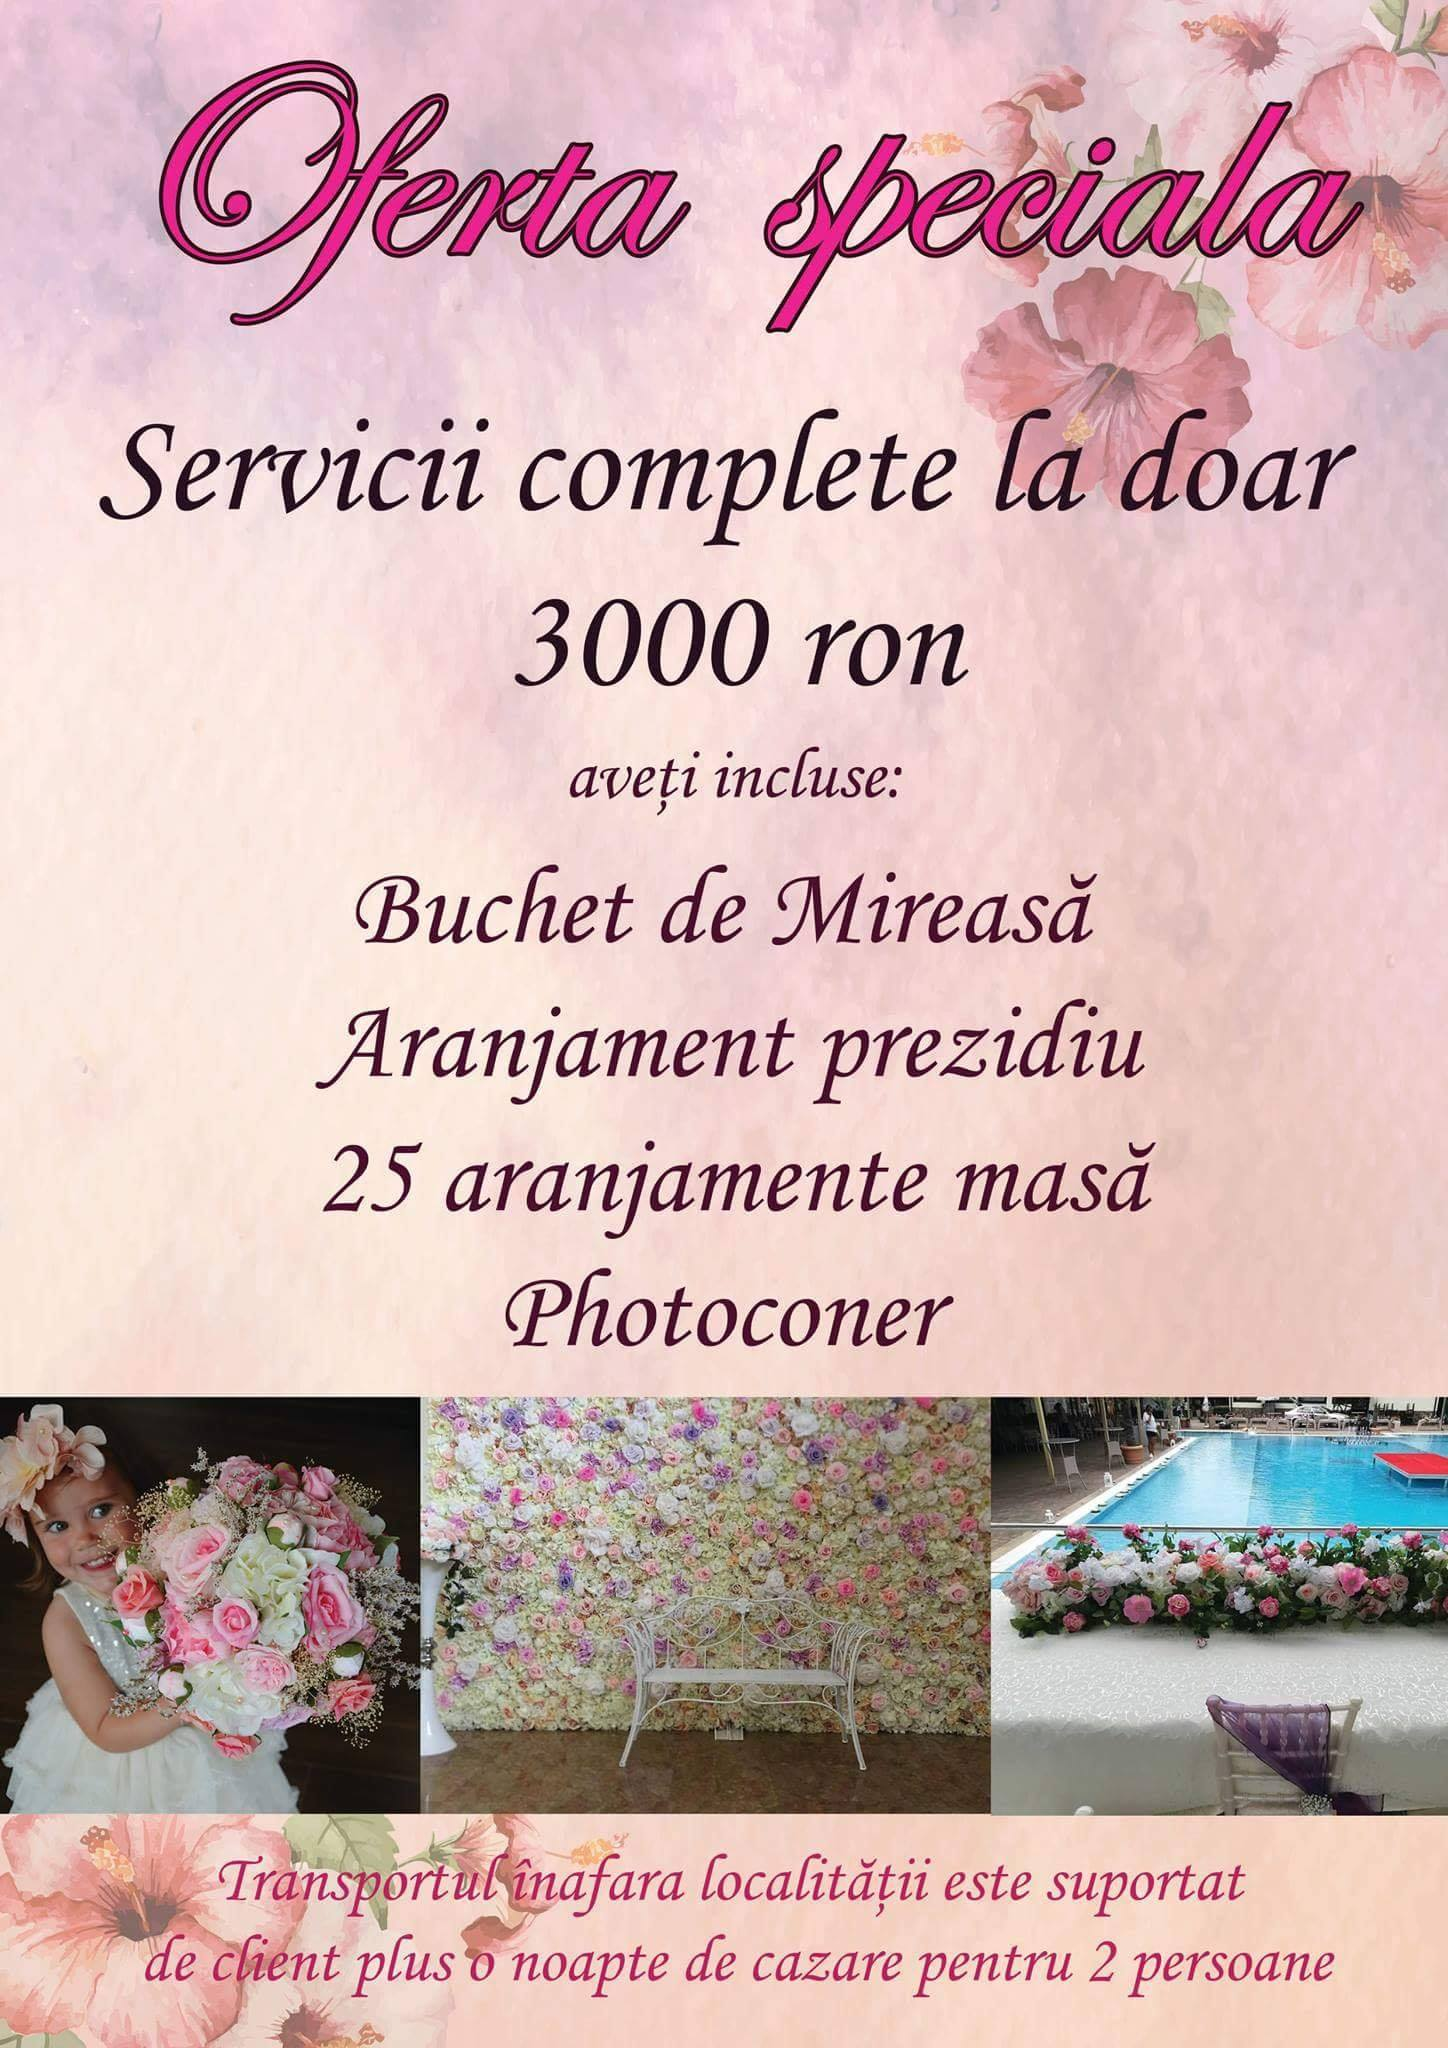 Oferta speciala Mini Flowers